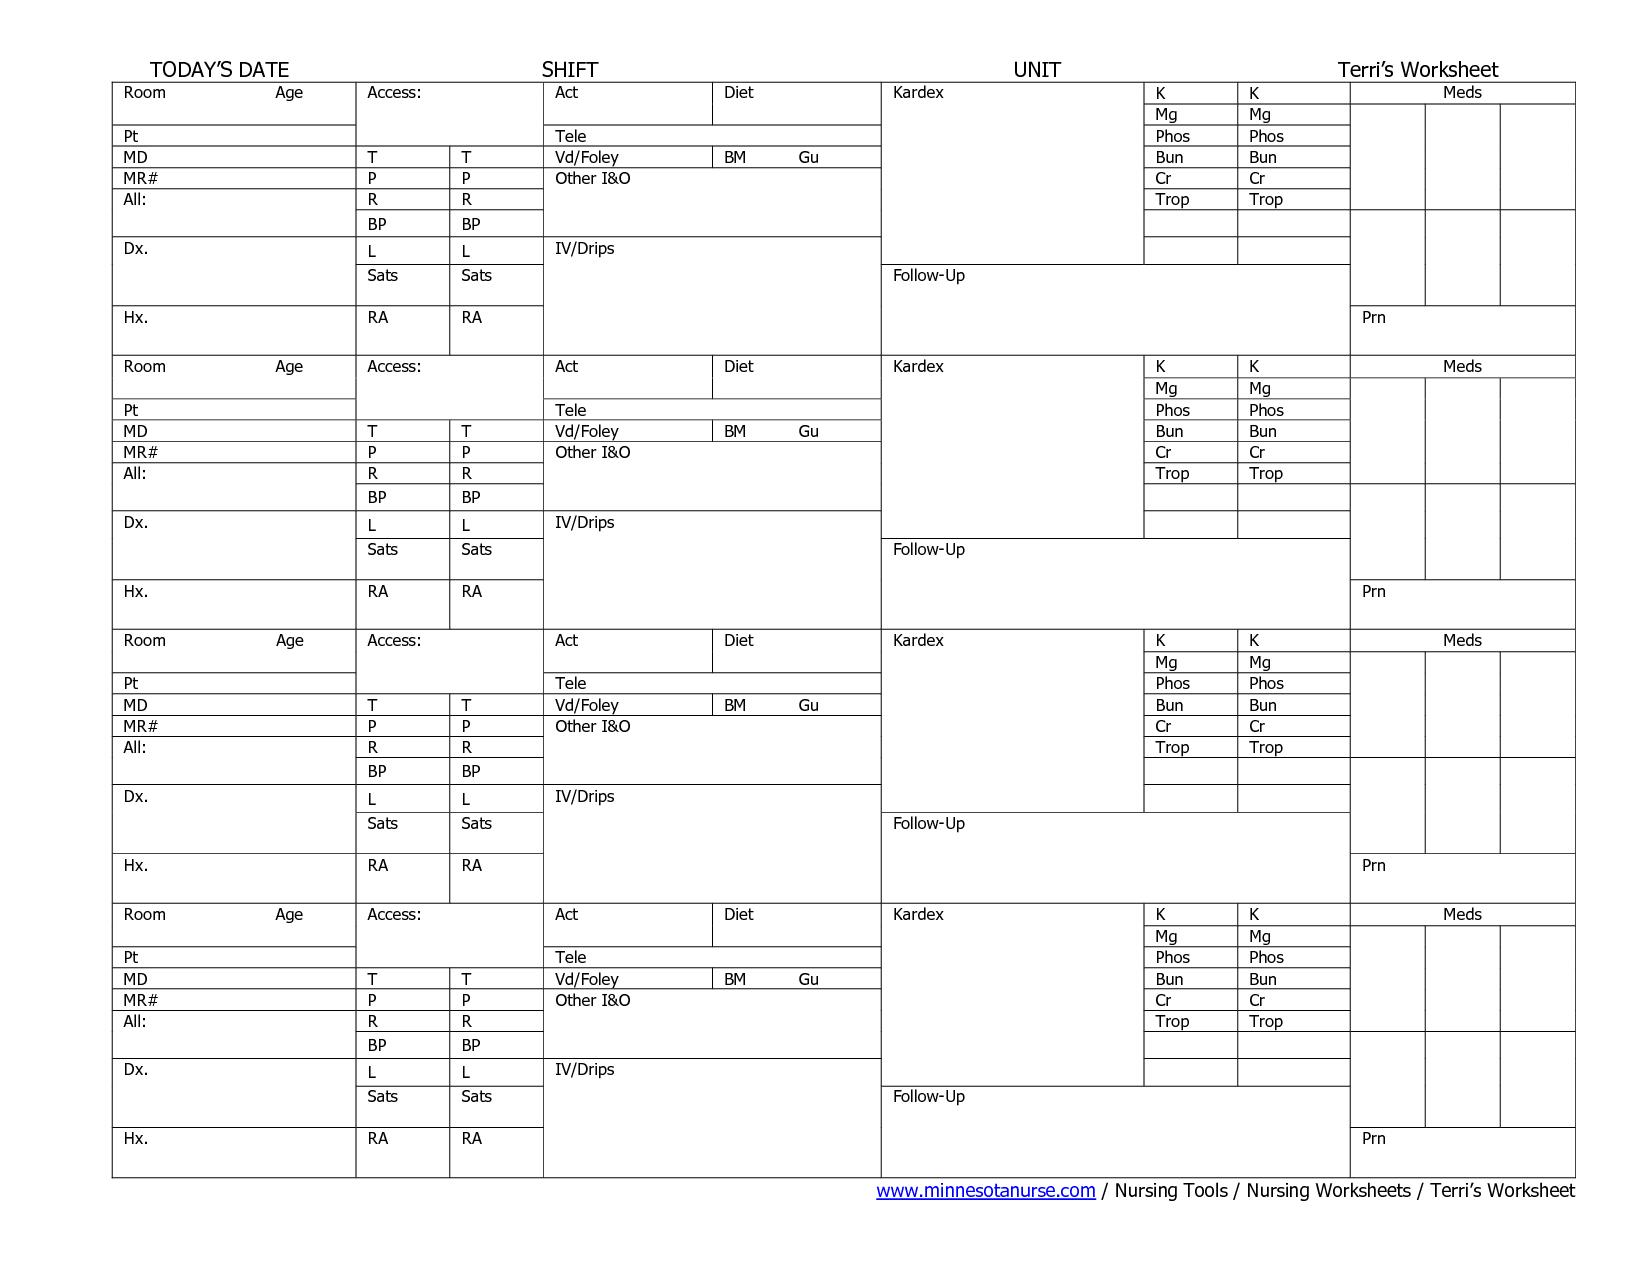 Nursing Worksheets Printable | Sample Nursing Worksheet, Free | Printable Nursing Worksheets